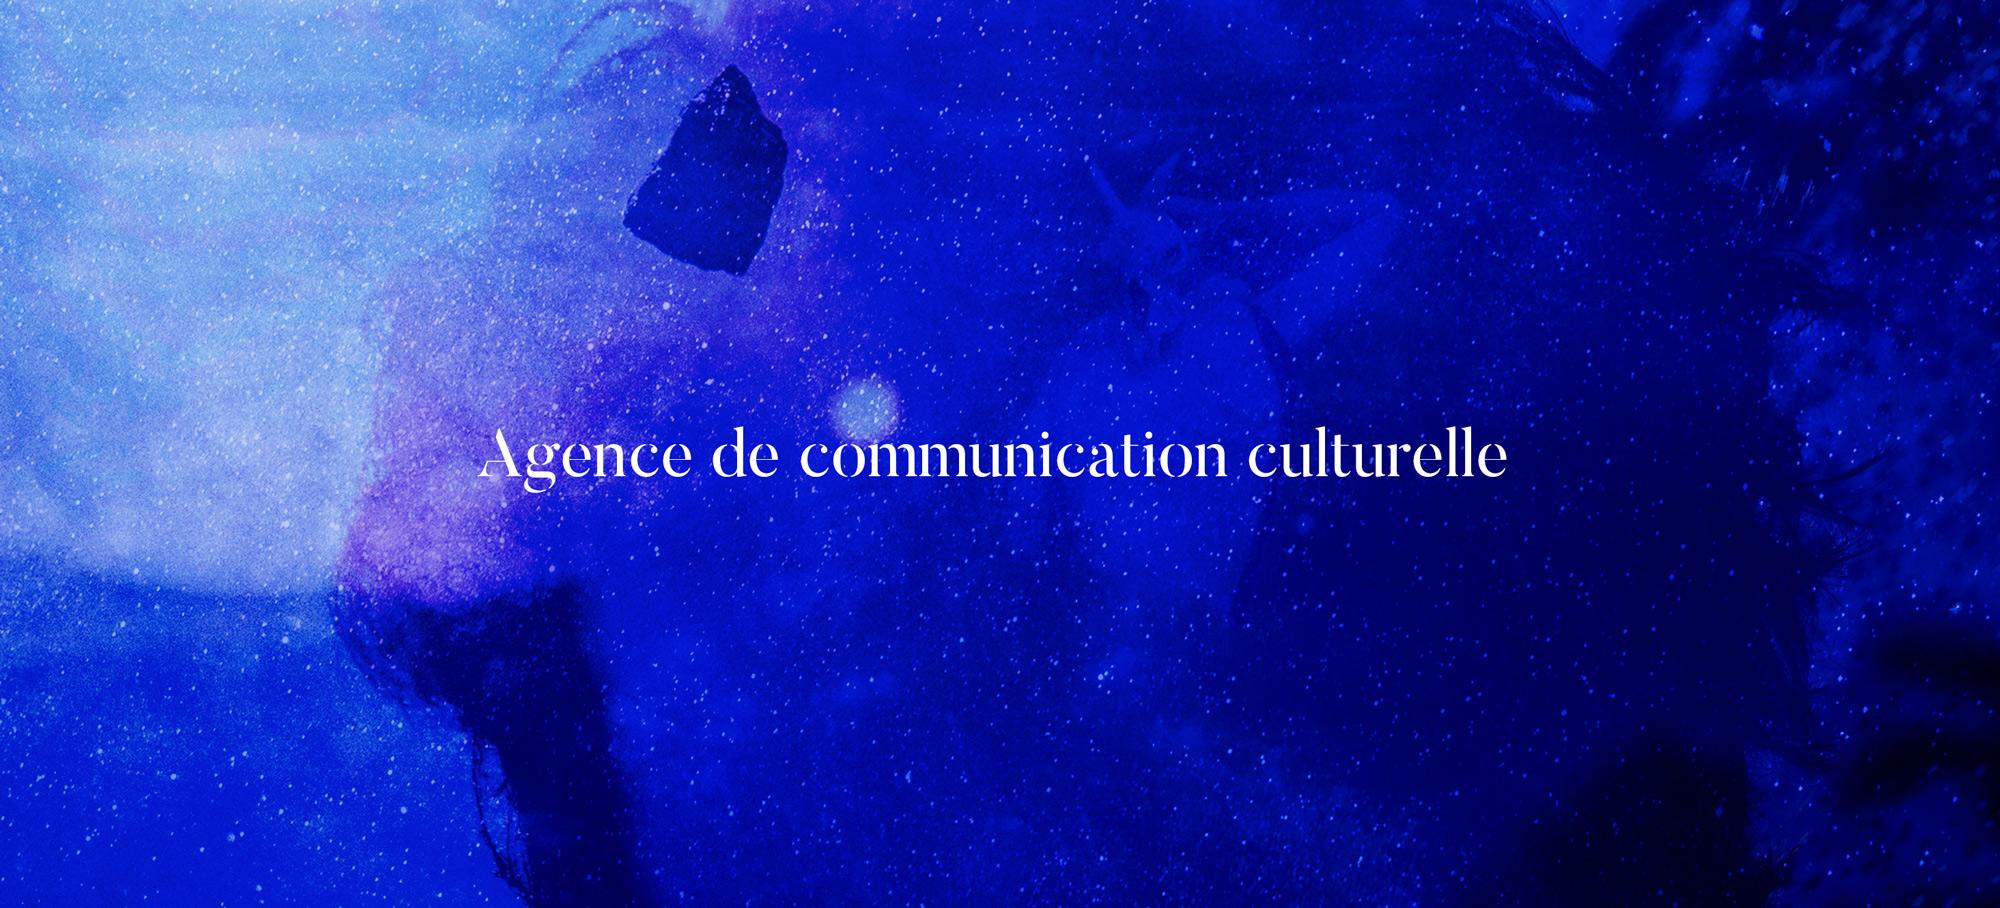 agence-COMMUNICATION-musique-classique-ysee-valentine-franssen